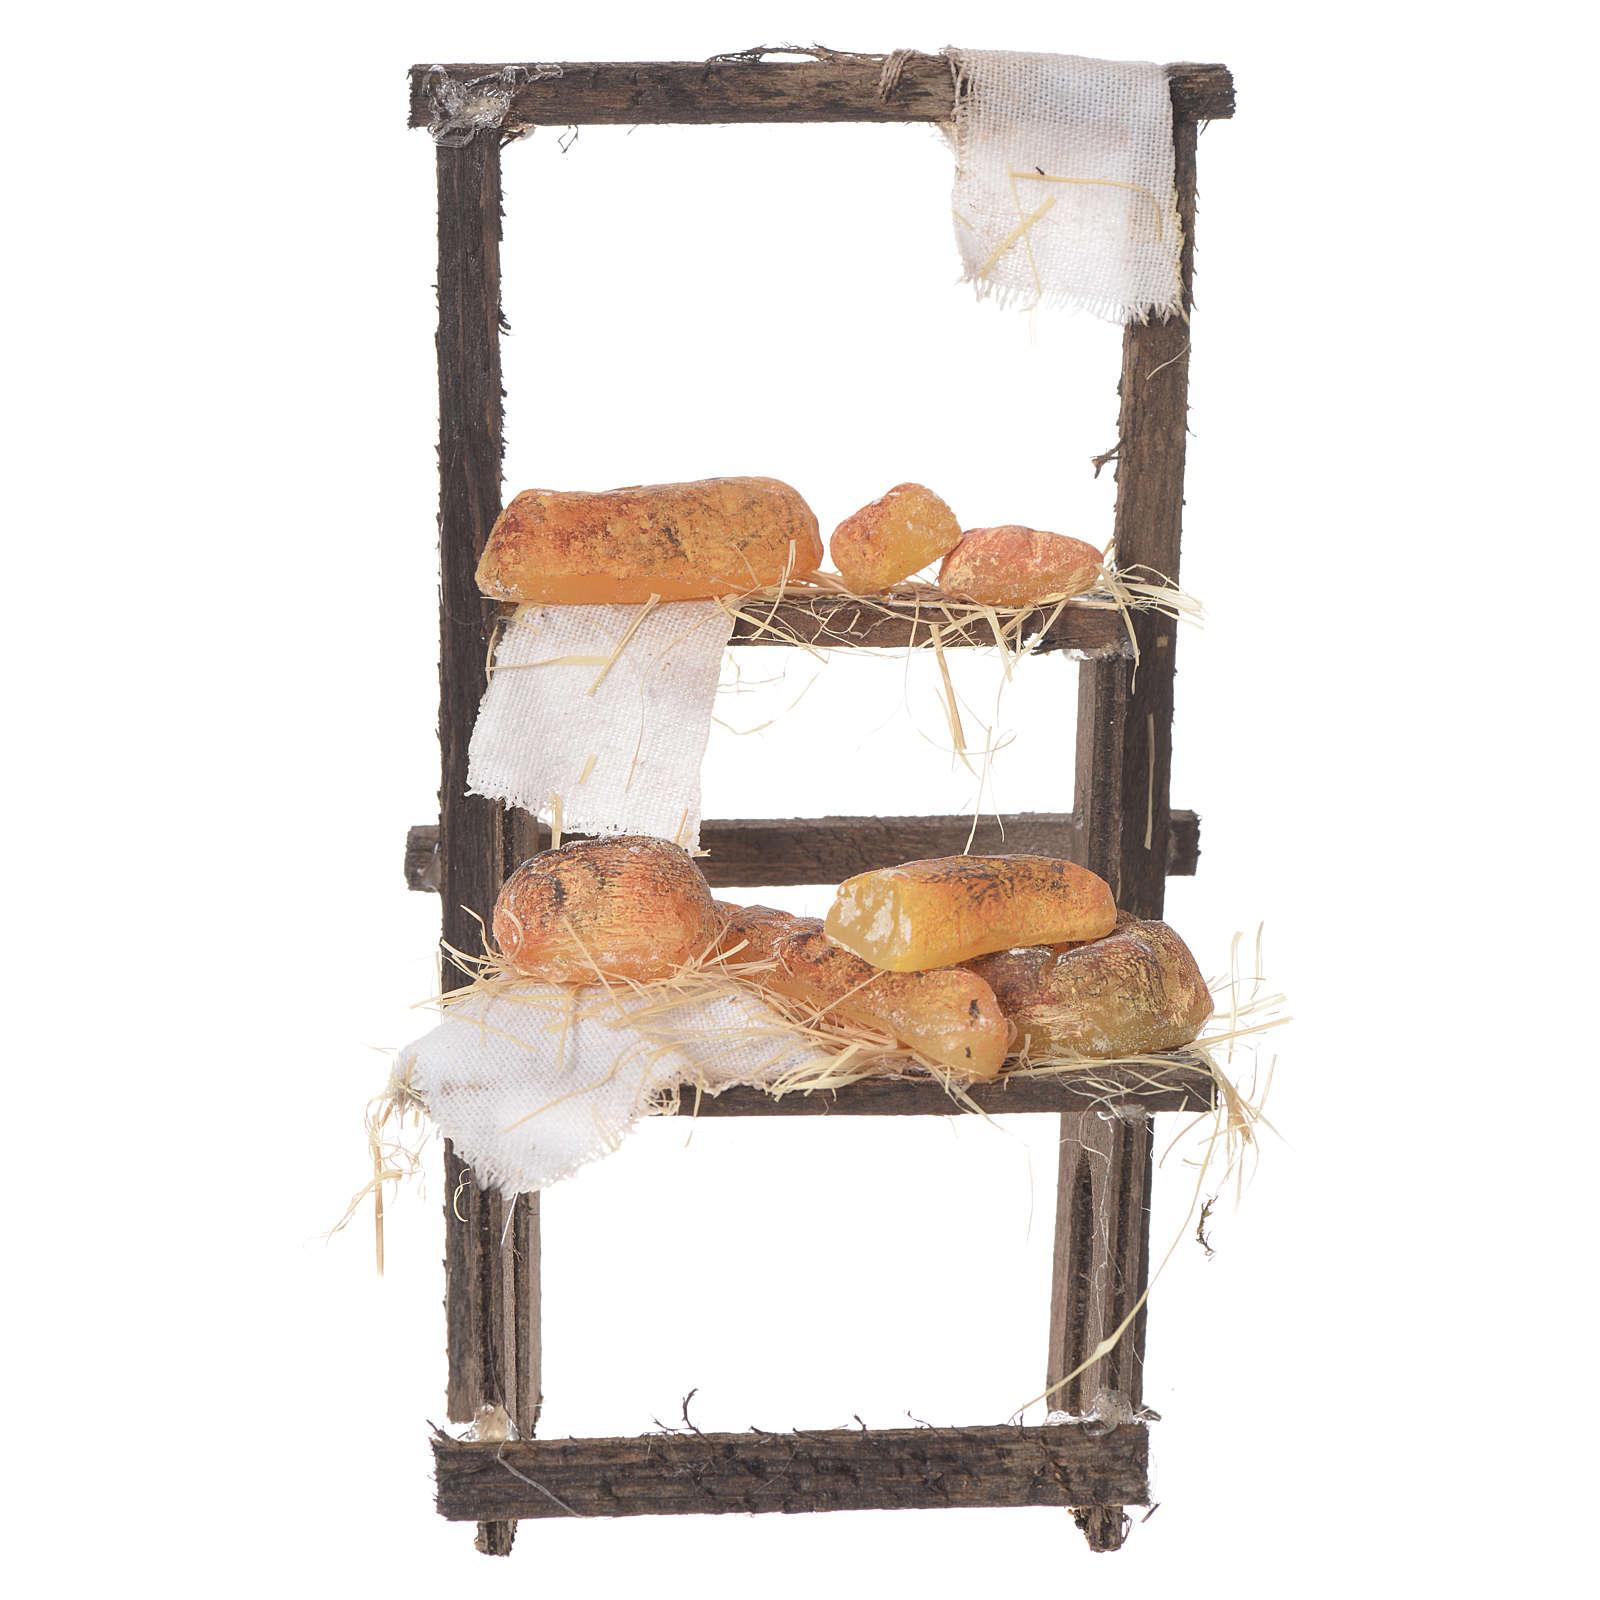 Baker's stall in wax, 13.5x8x5.5cm 4